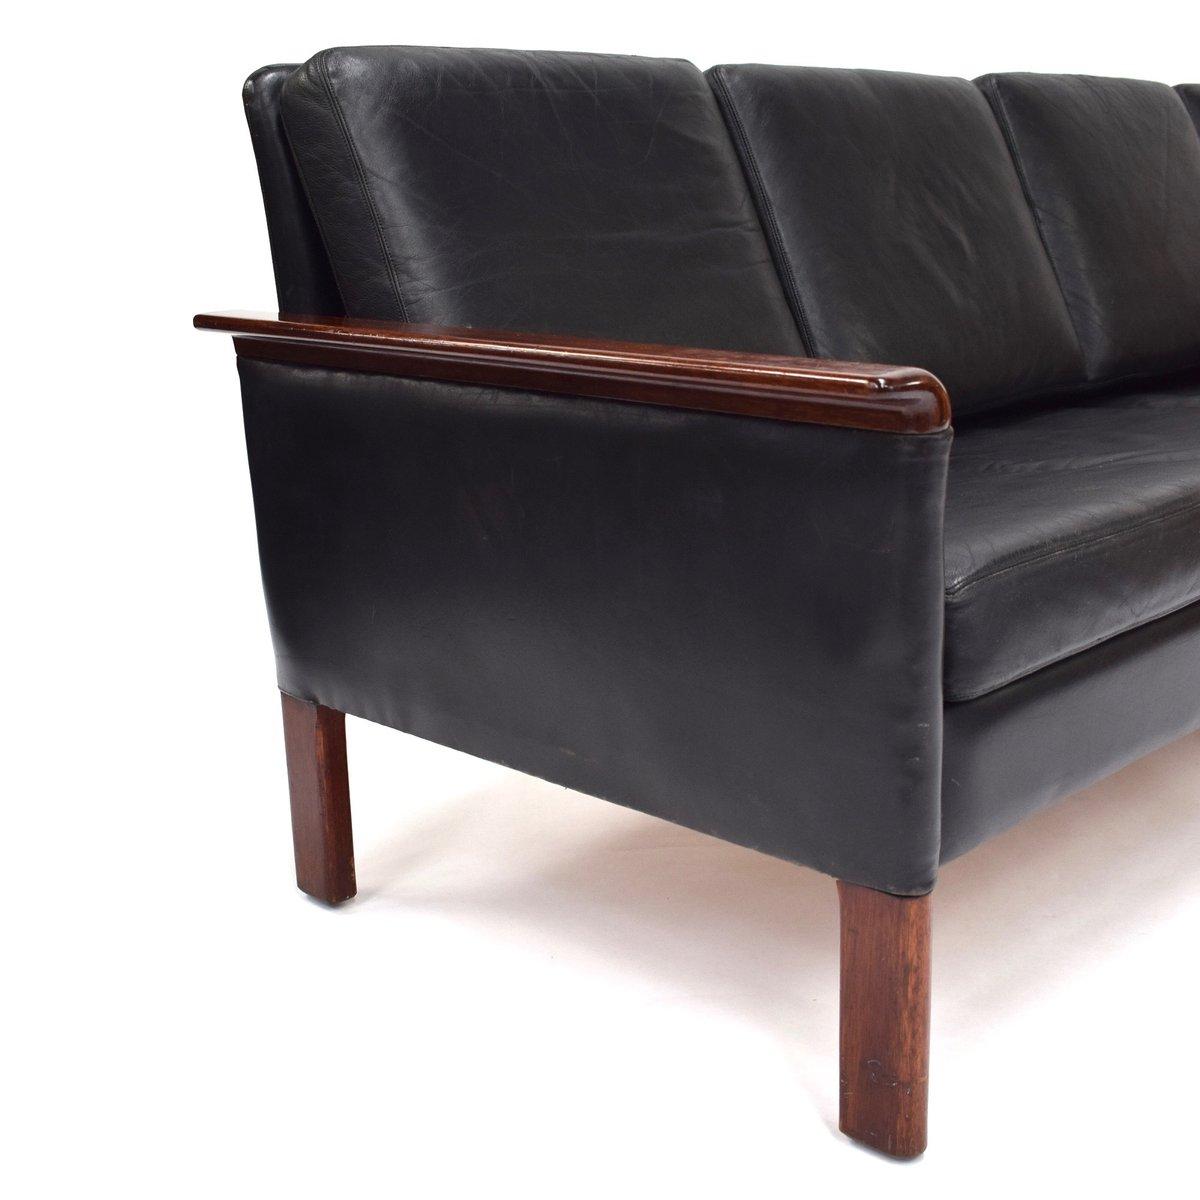 Leather Sofa Wholesalers Uk: Scandinavian Black Leather Sofa, 1950s For Sale At Pamono